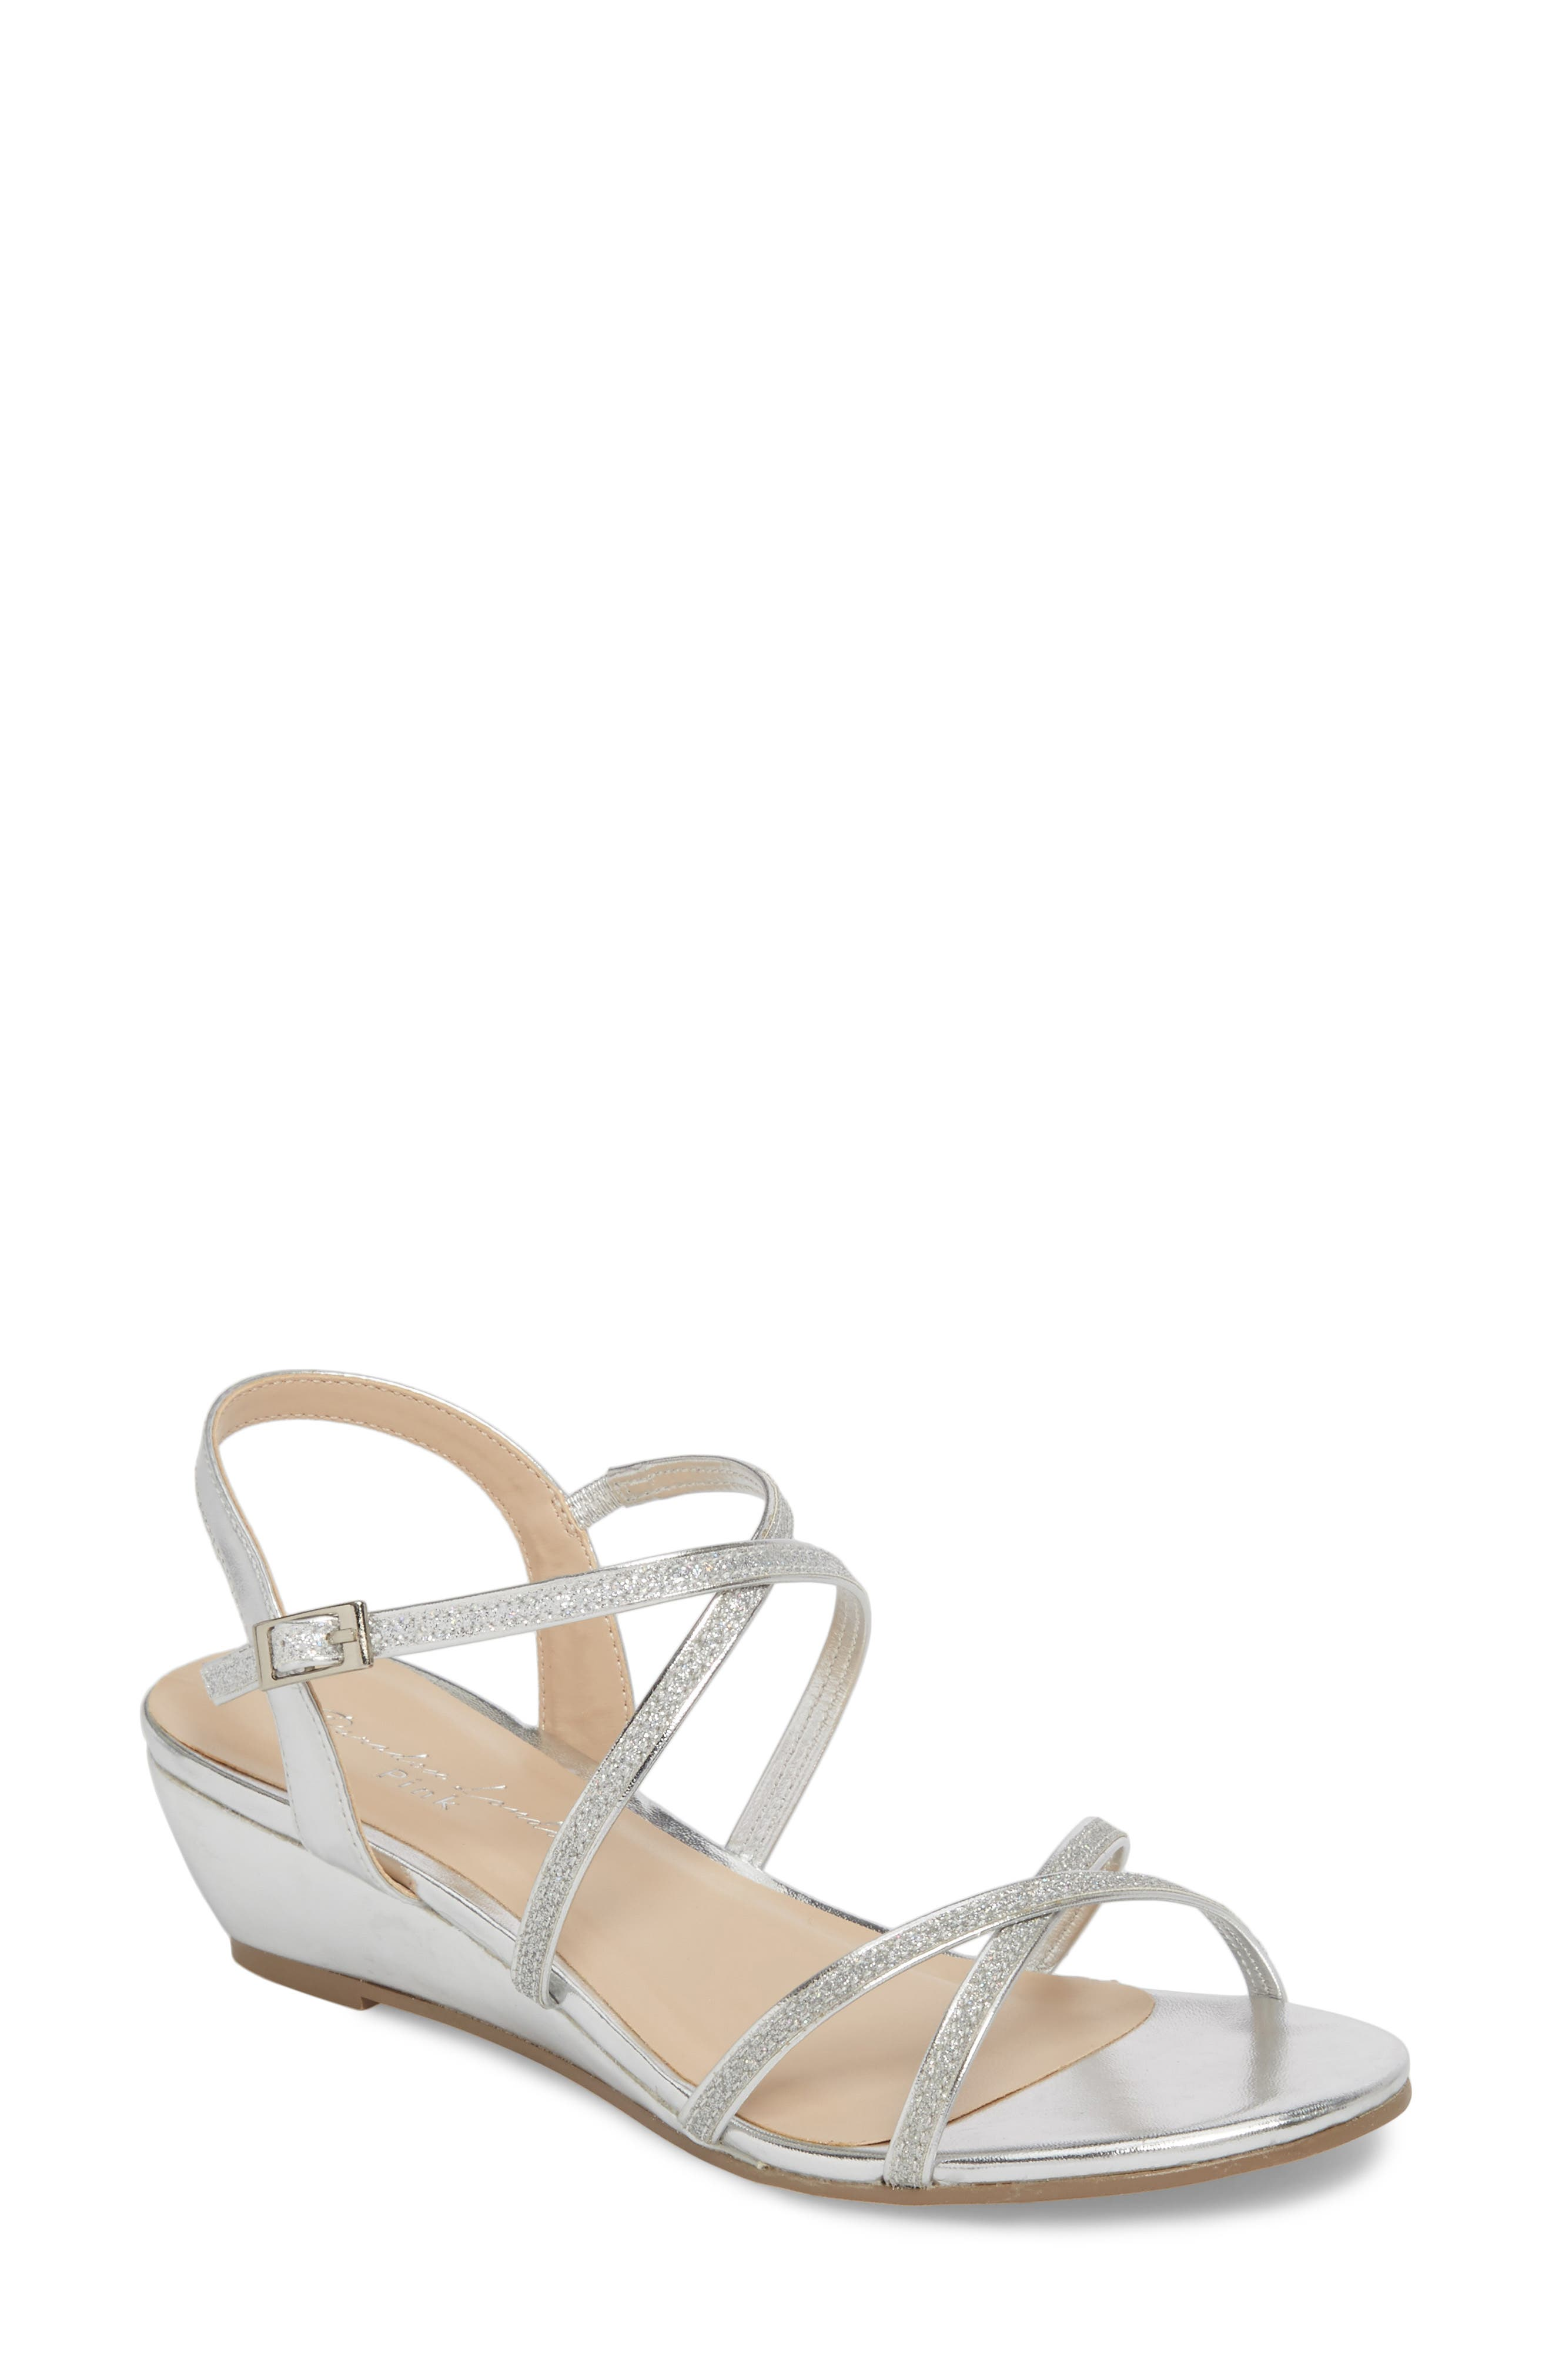 Kadie Wedge Sandal,                             Main thumbnail 1, color,                             Silver Glitter